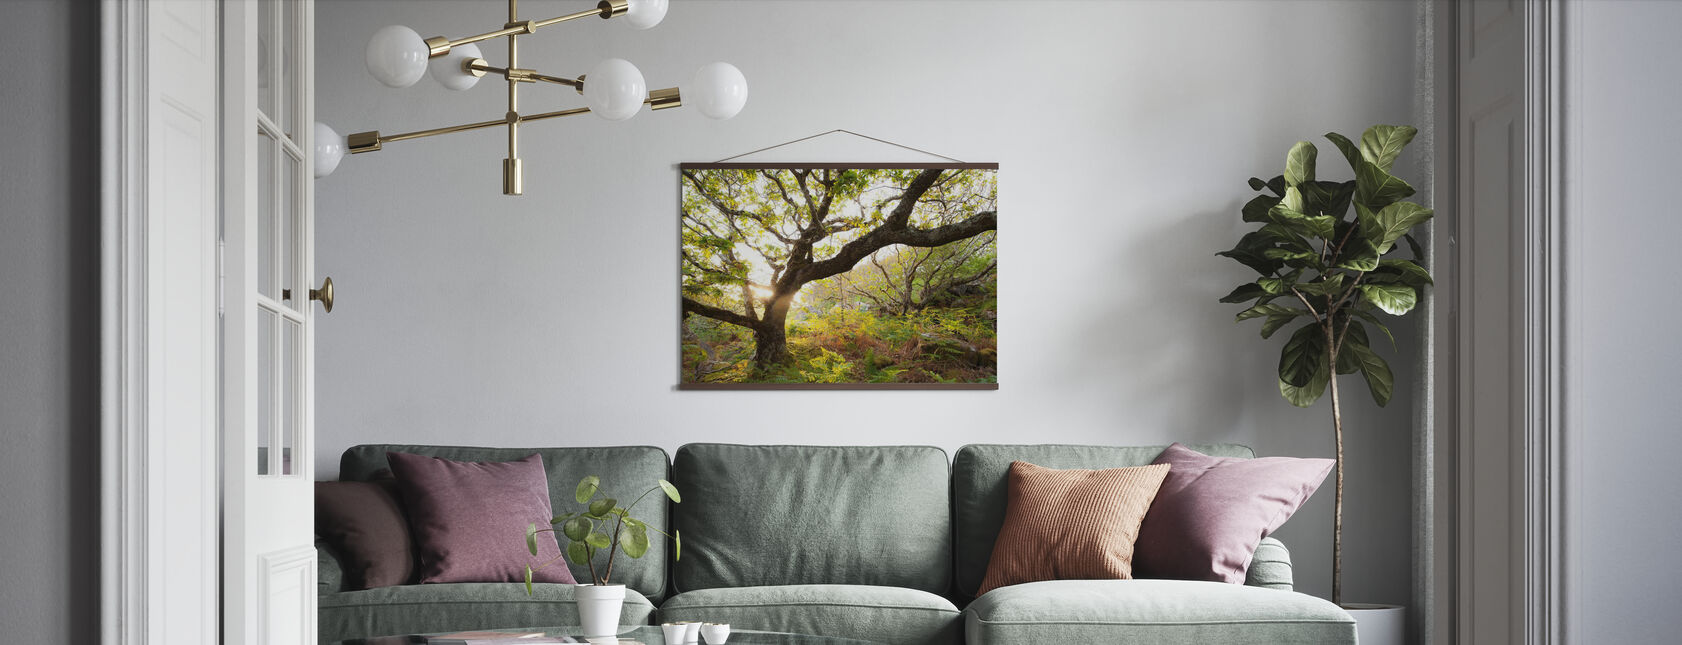 Schots eikenhout met achtergrondverlichting - Poster - Woonkamer